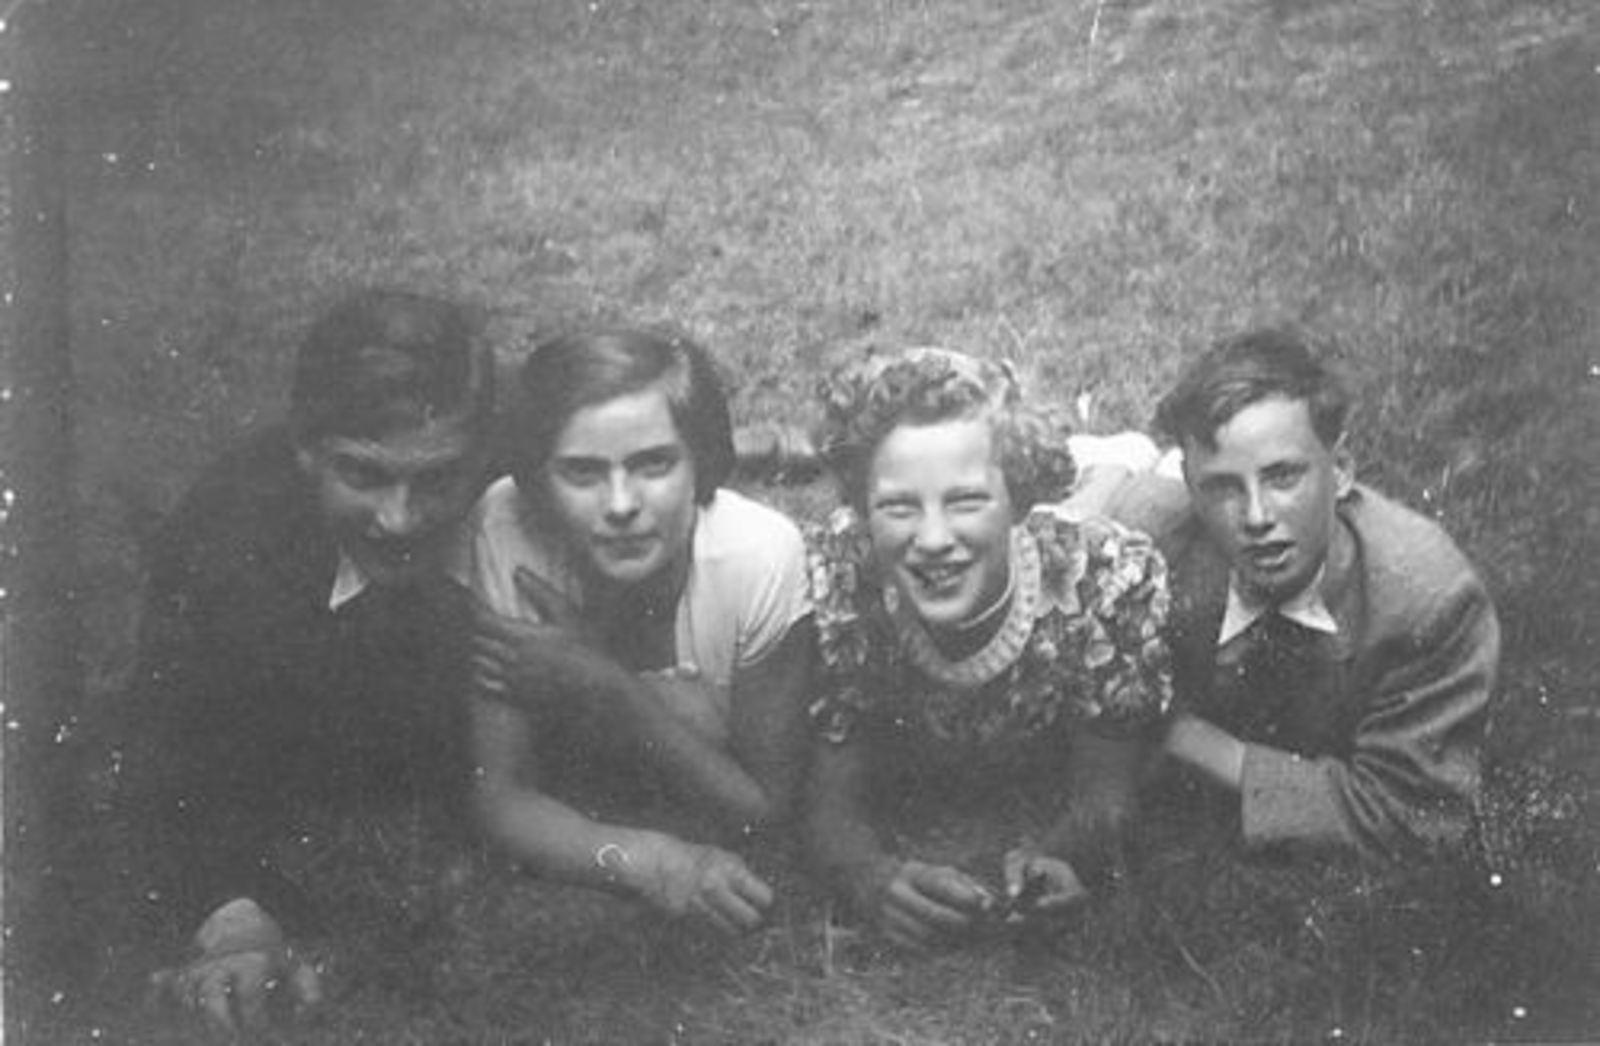 Koeckhoven Cor 1939 1952 in Groenendaal